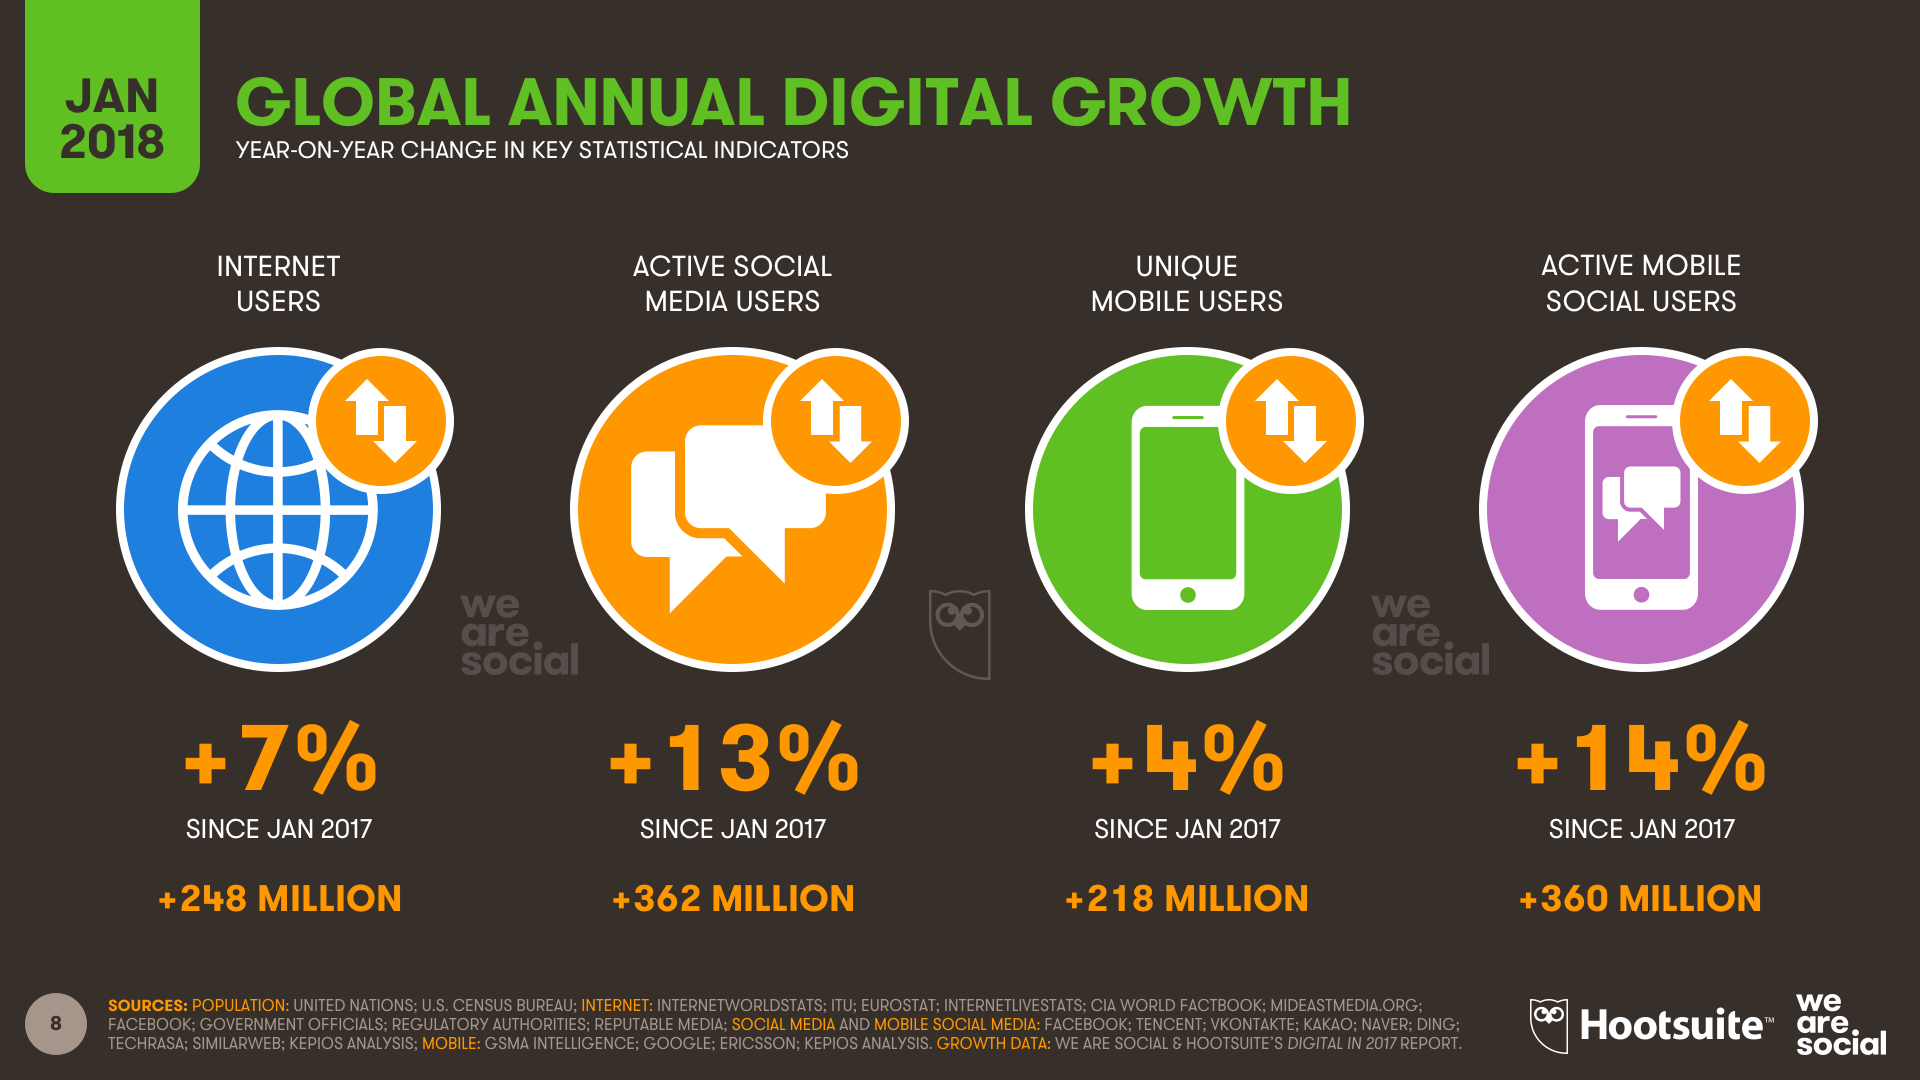 Annual Digital Growth to Jan 2018